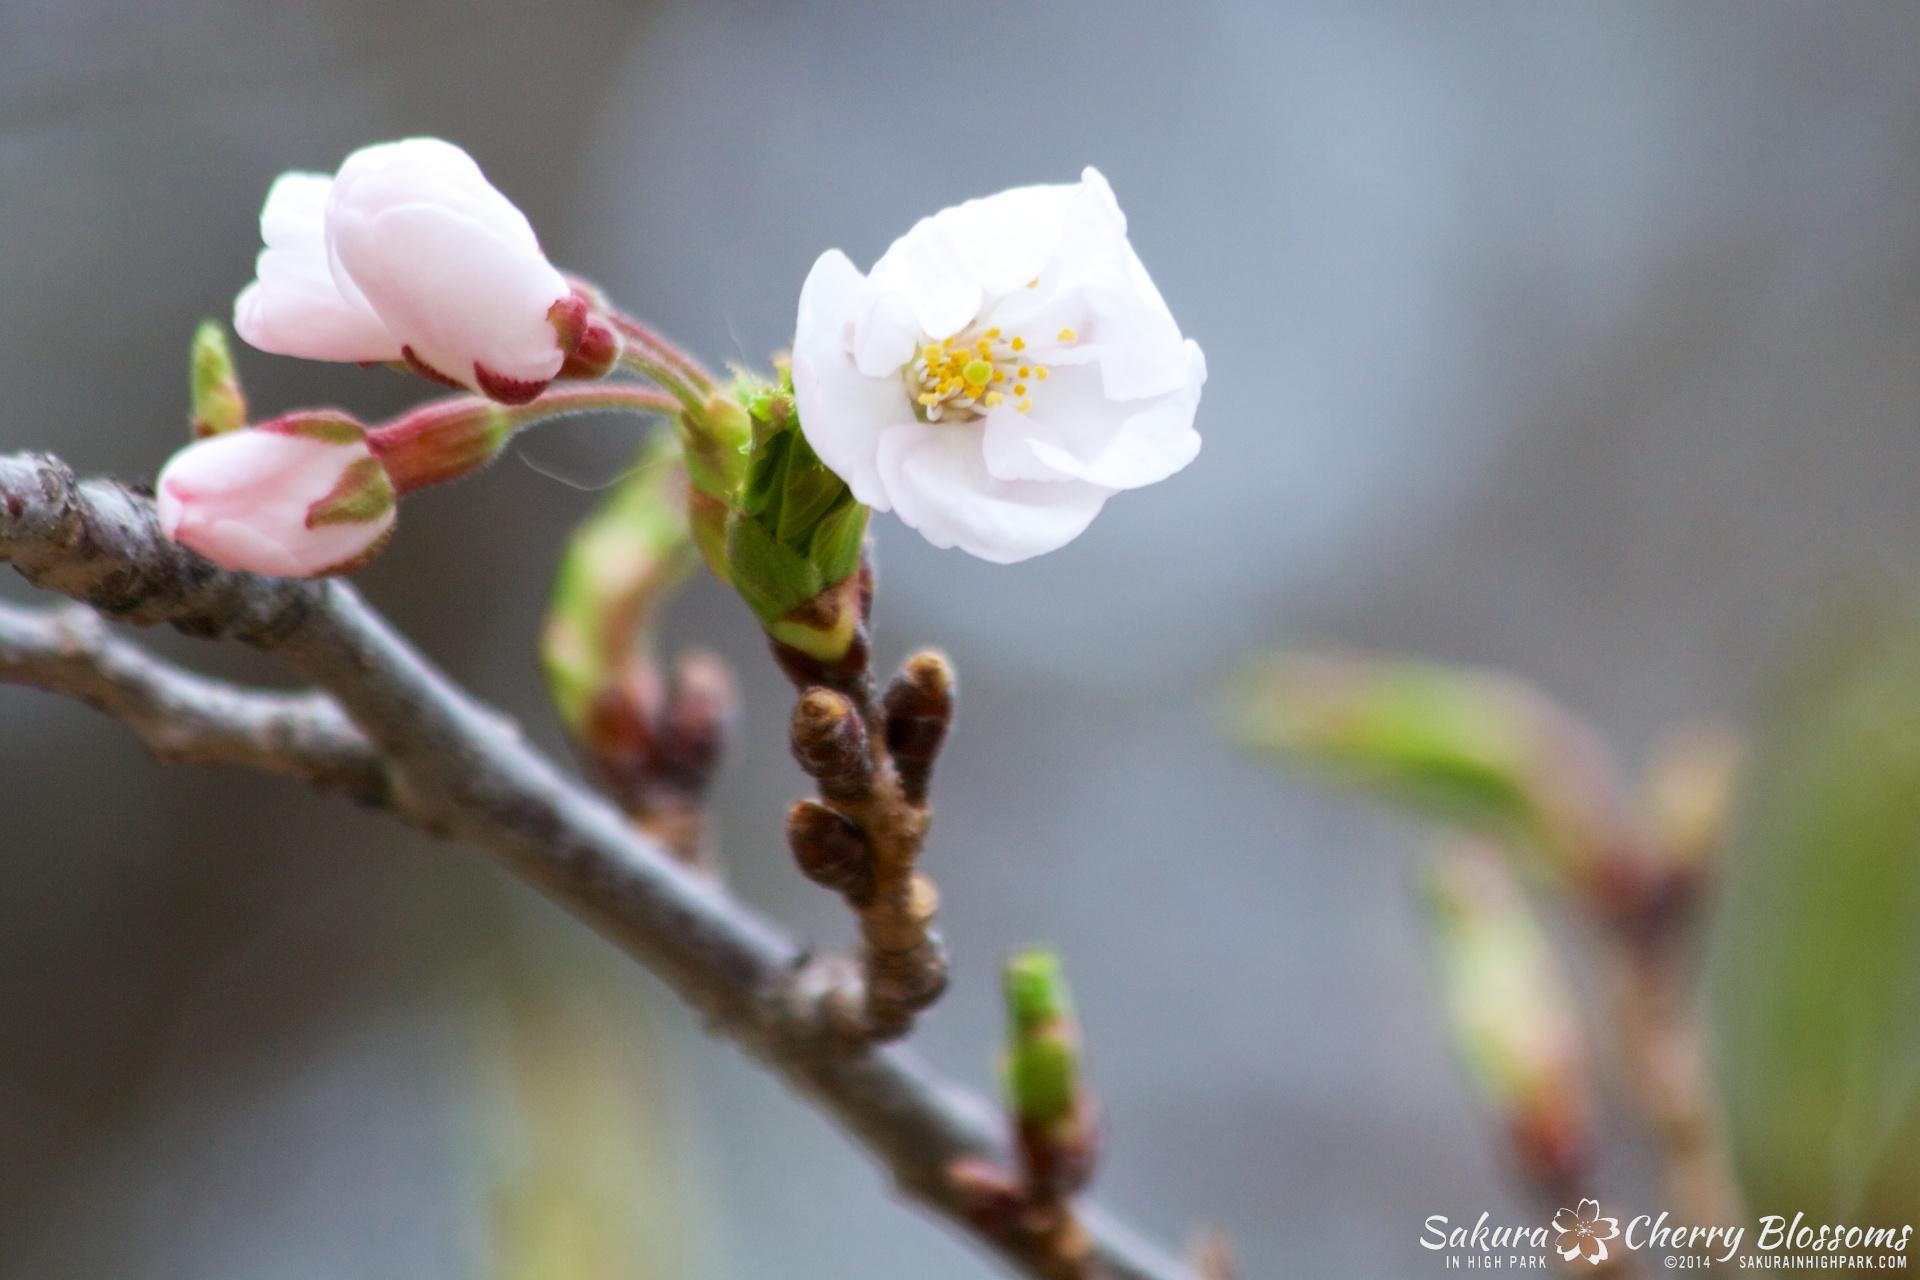 SakuraInHighPark-May0914-377.jpg